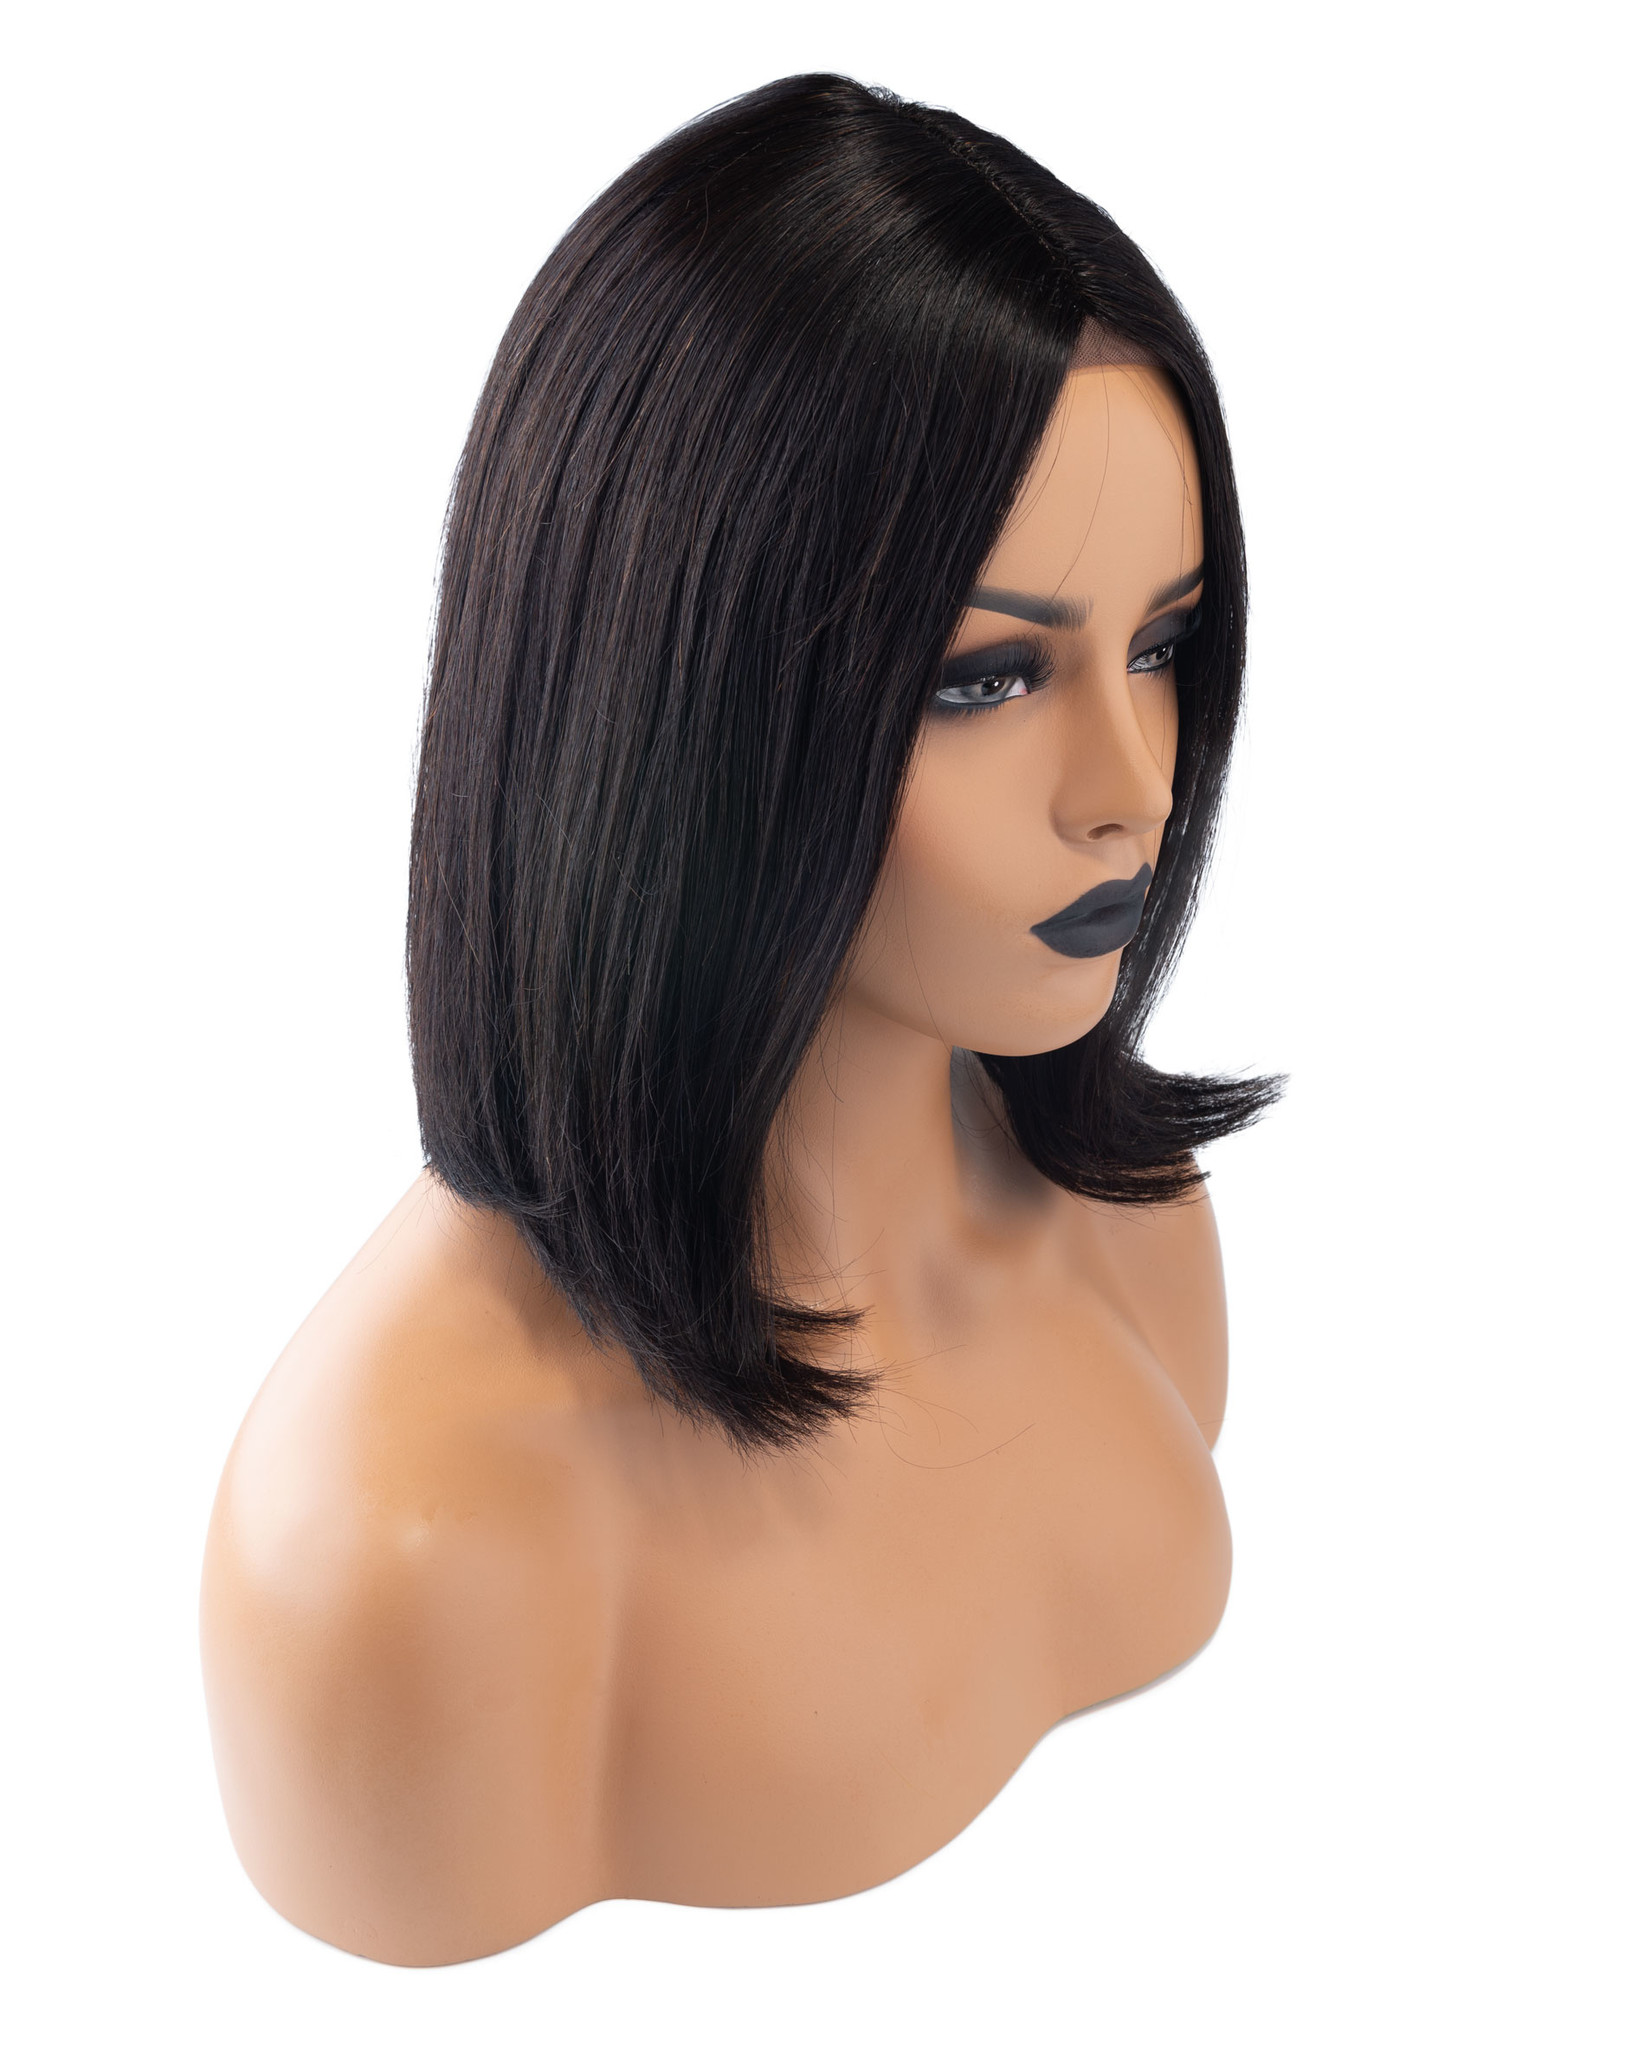 Shri SilverFox Indian Shri Front Lace Wig - BOB - 10''